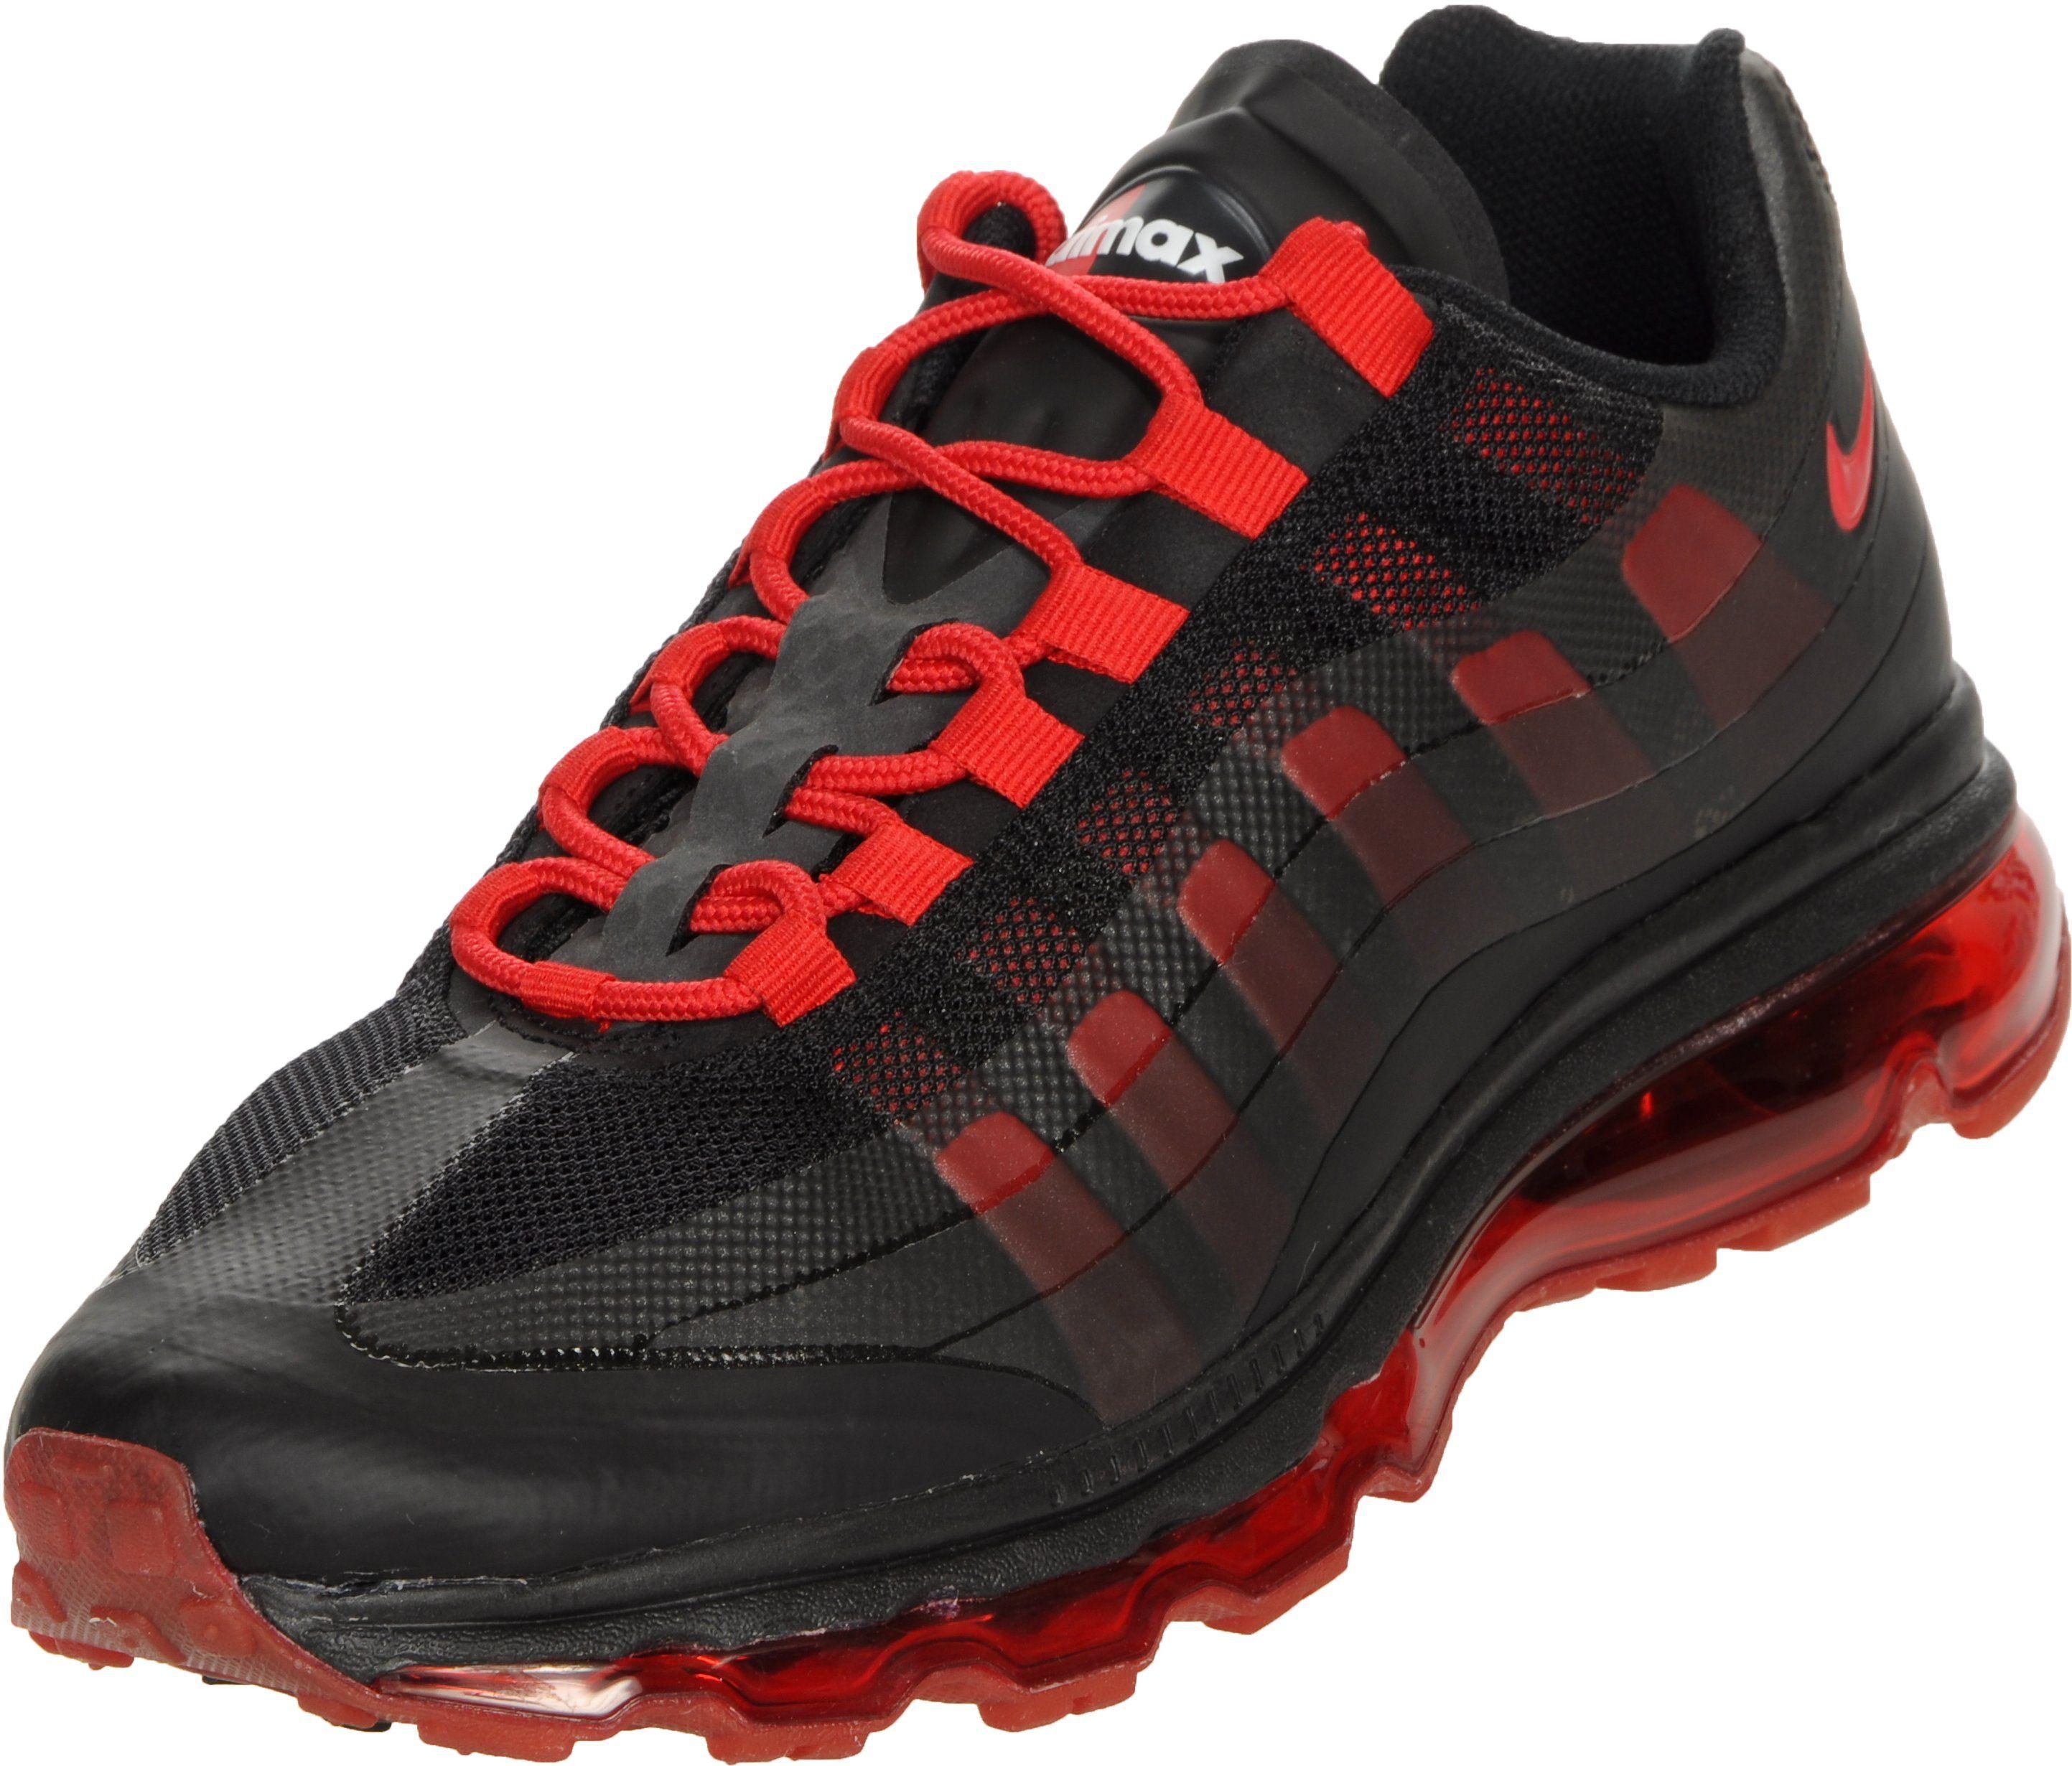 Men Nike Air Max 95 360 Shoes Grey White,red nike air max